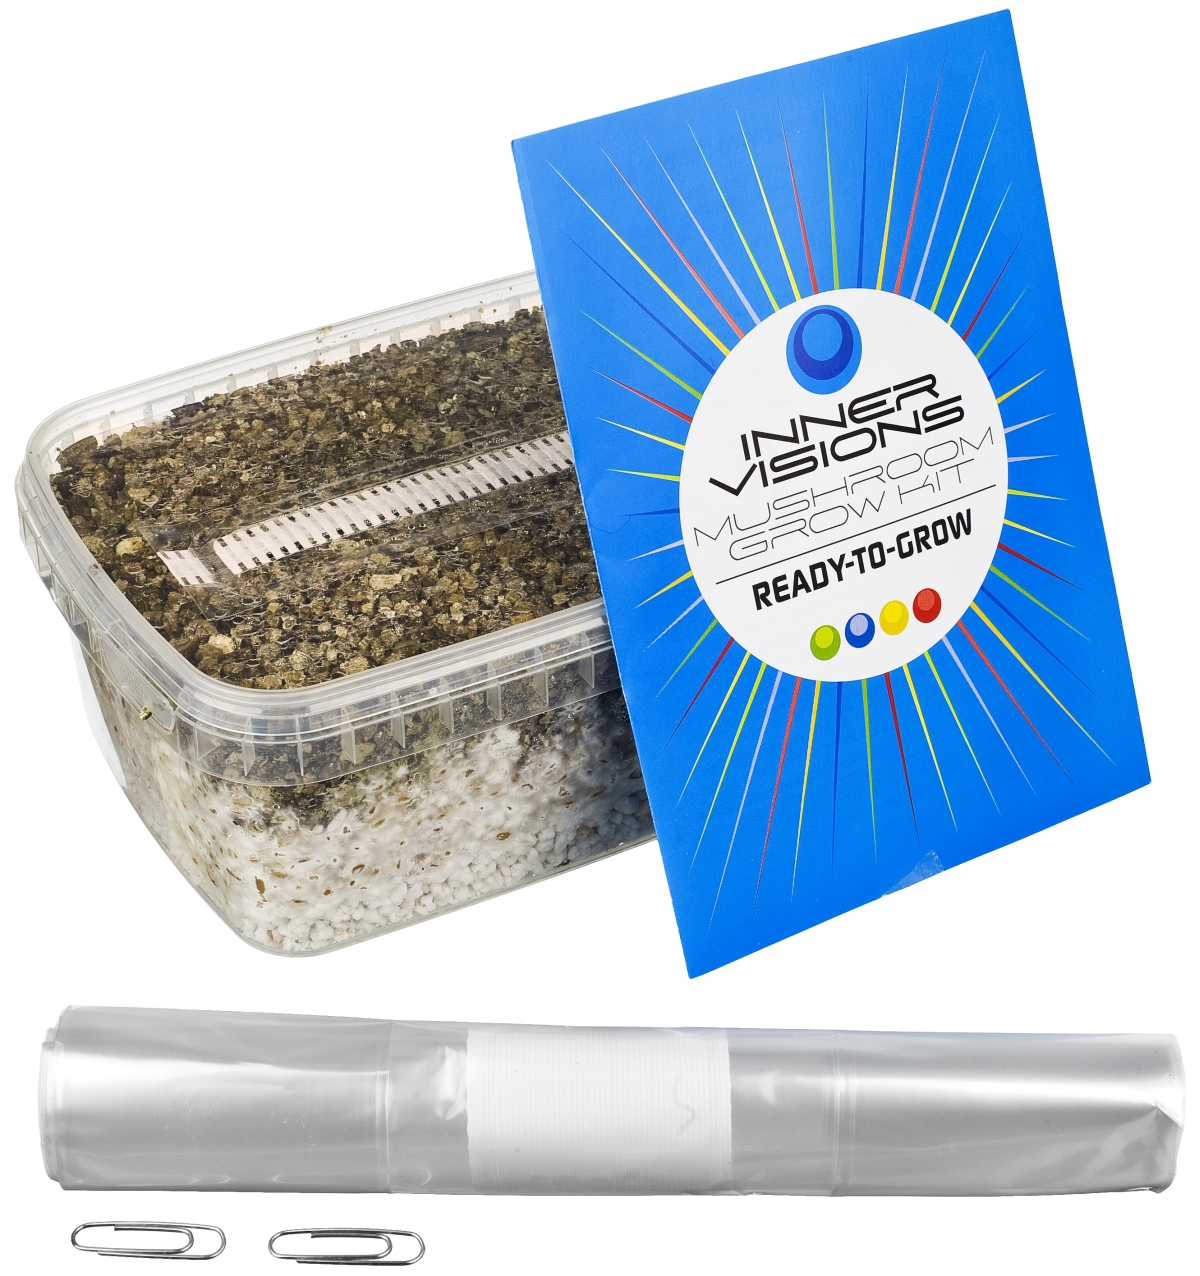 Mushroom Grow Kit Ready-To-Grow - Innervisions